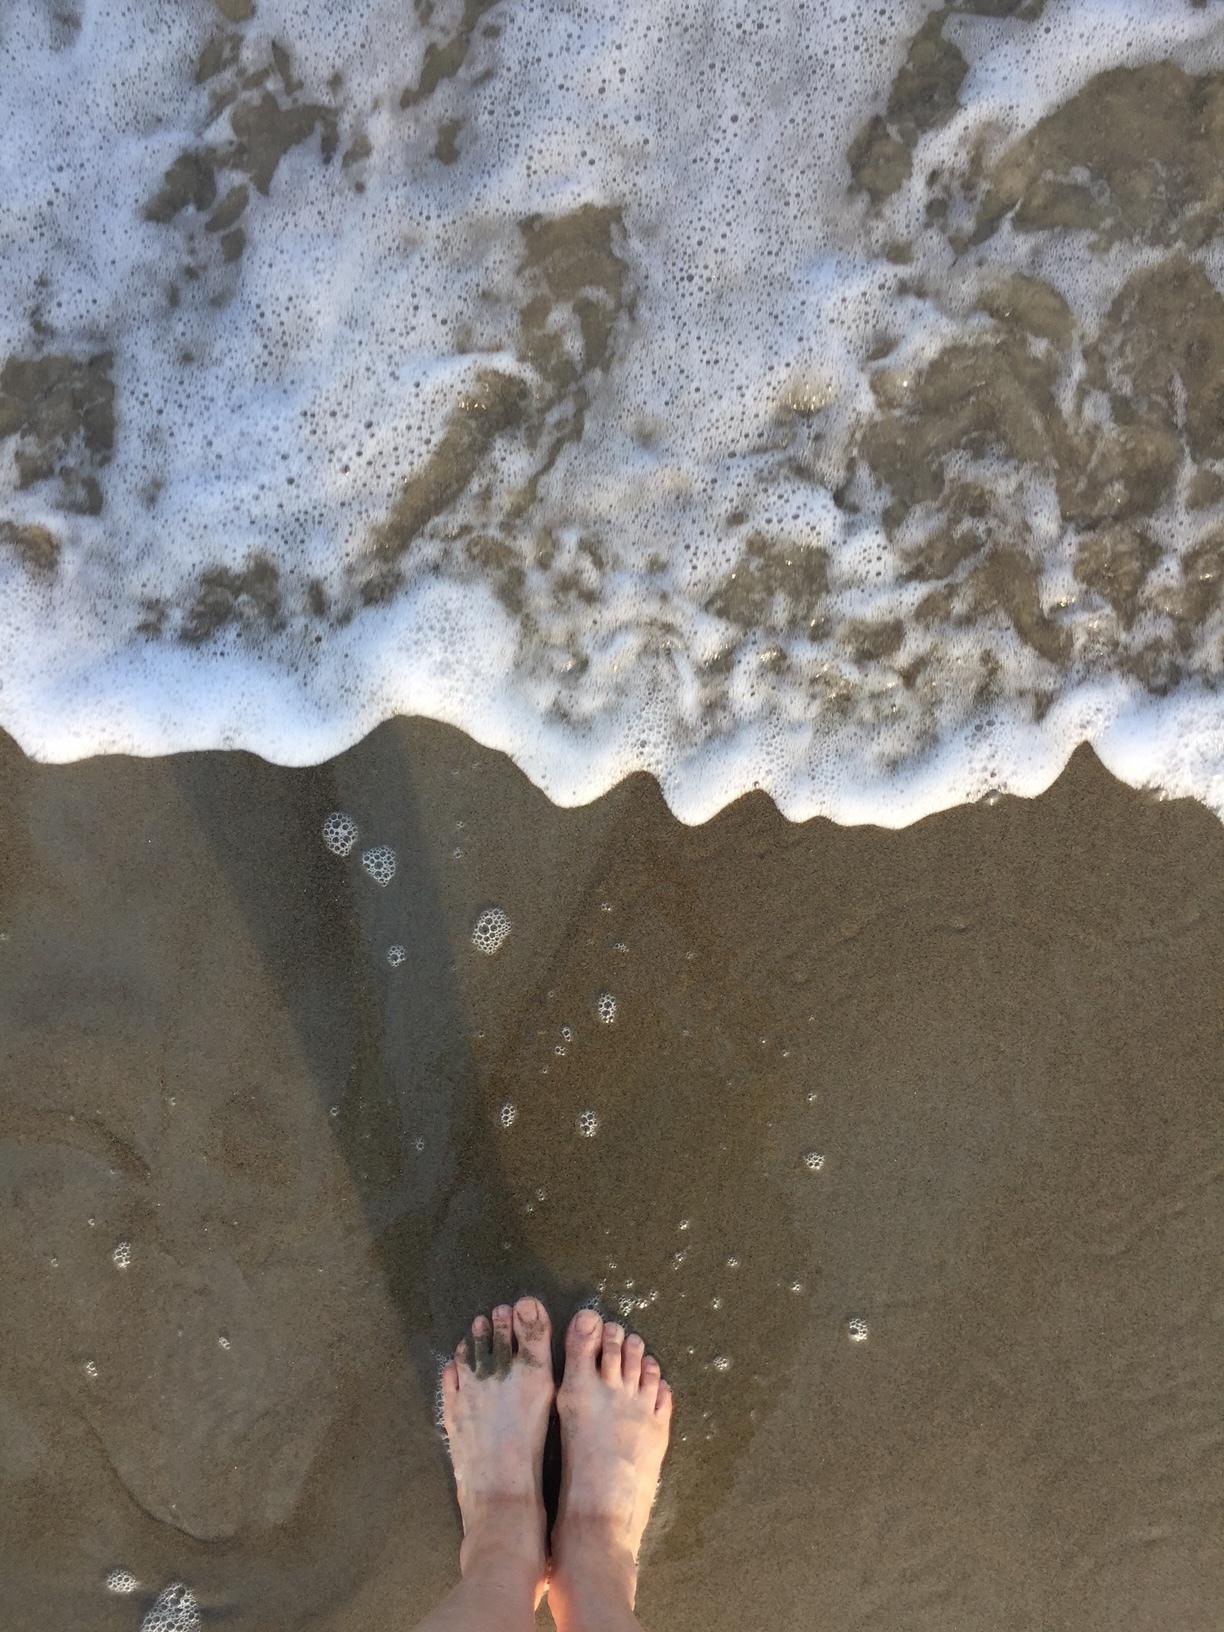 ocean and feet